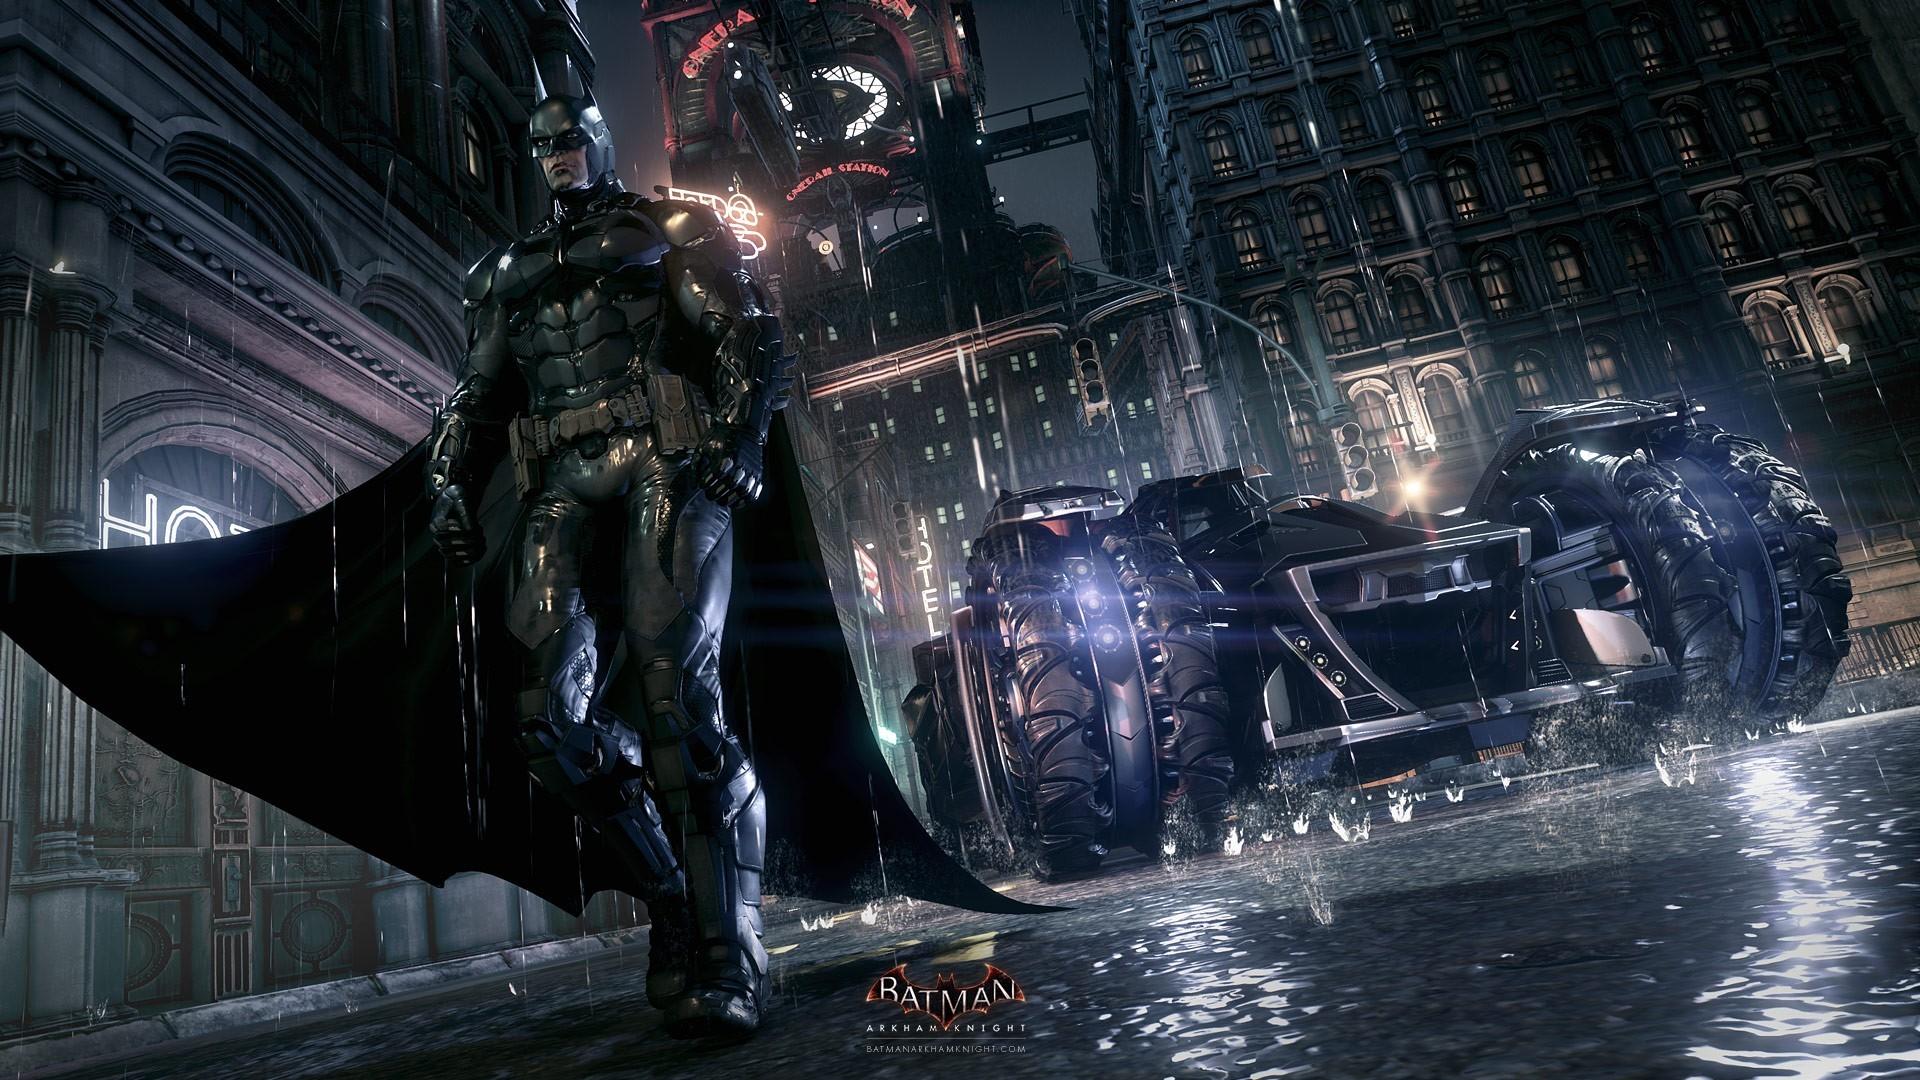 batman-arkham-knight-jeux-video-fond-ecran-wallpaper-